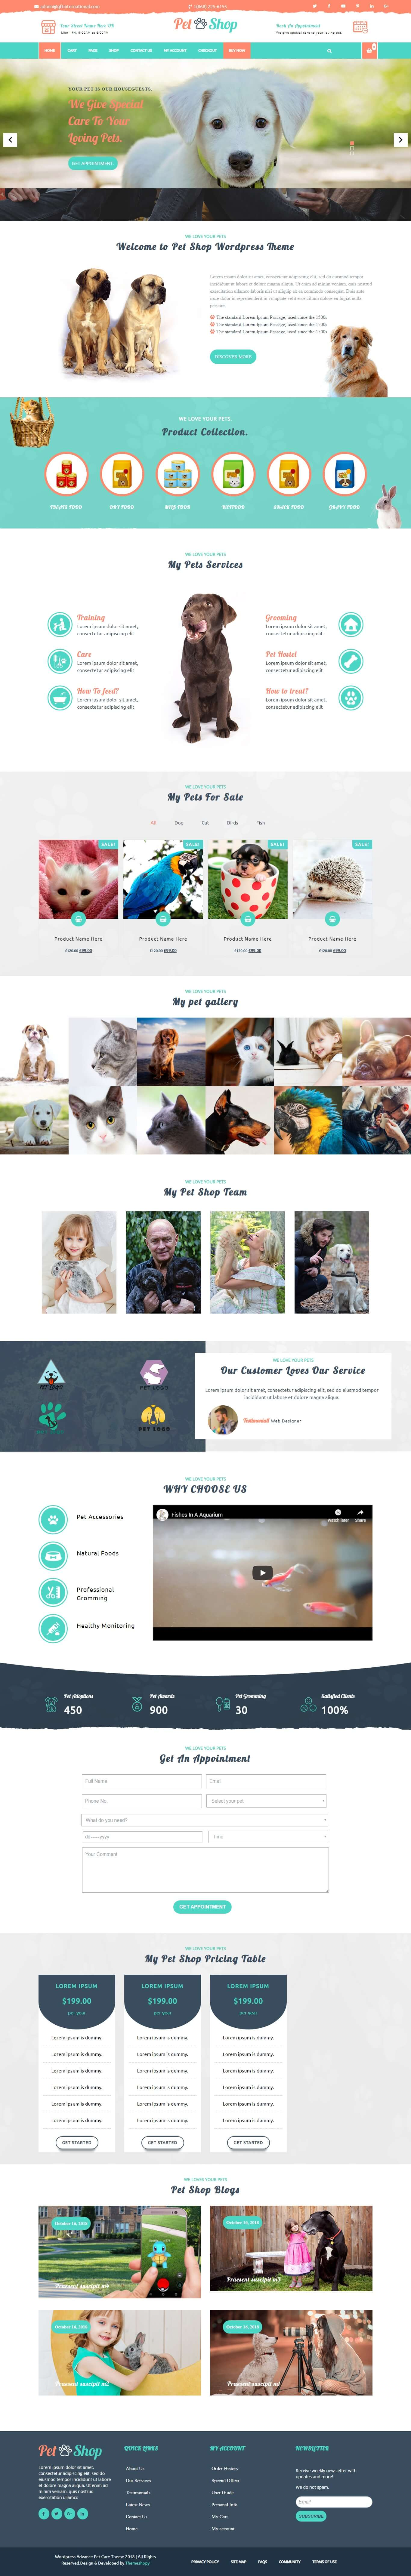 Advance Pet Care